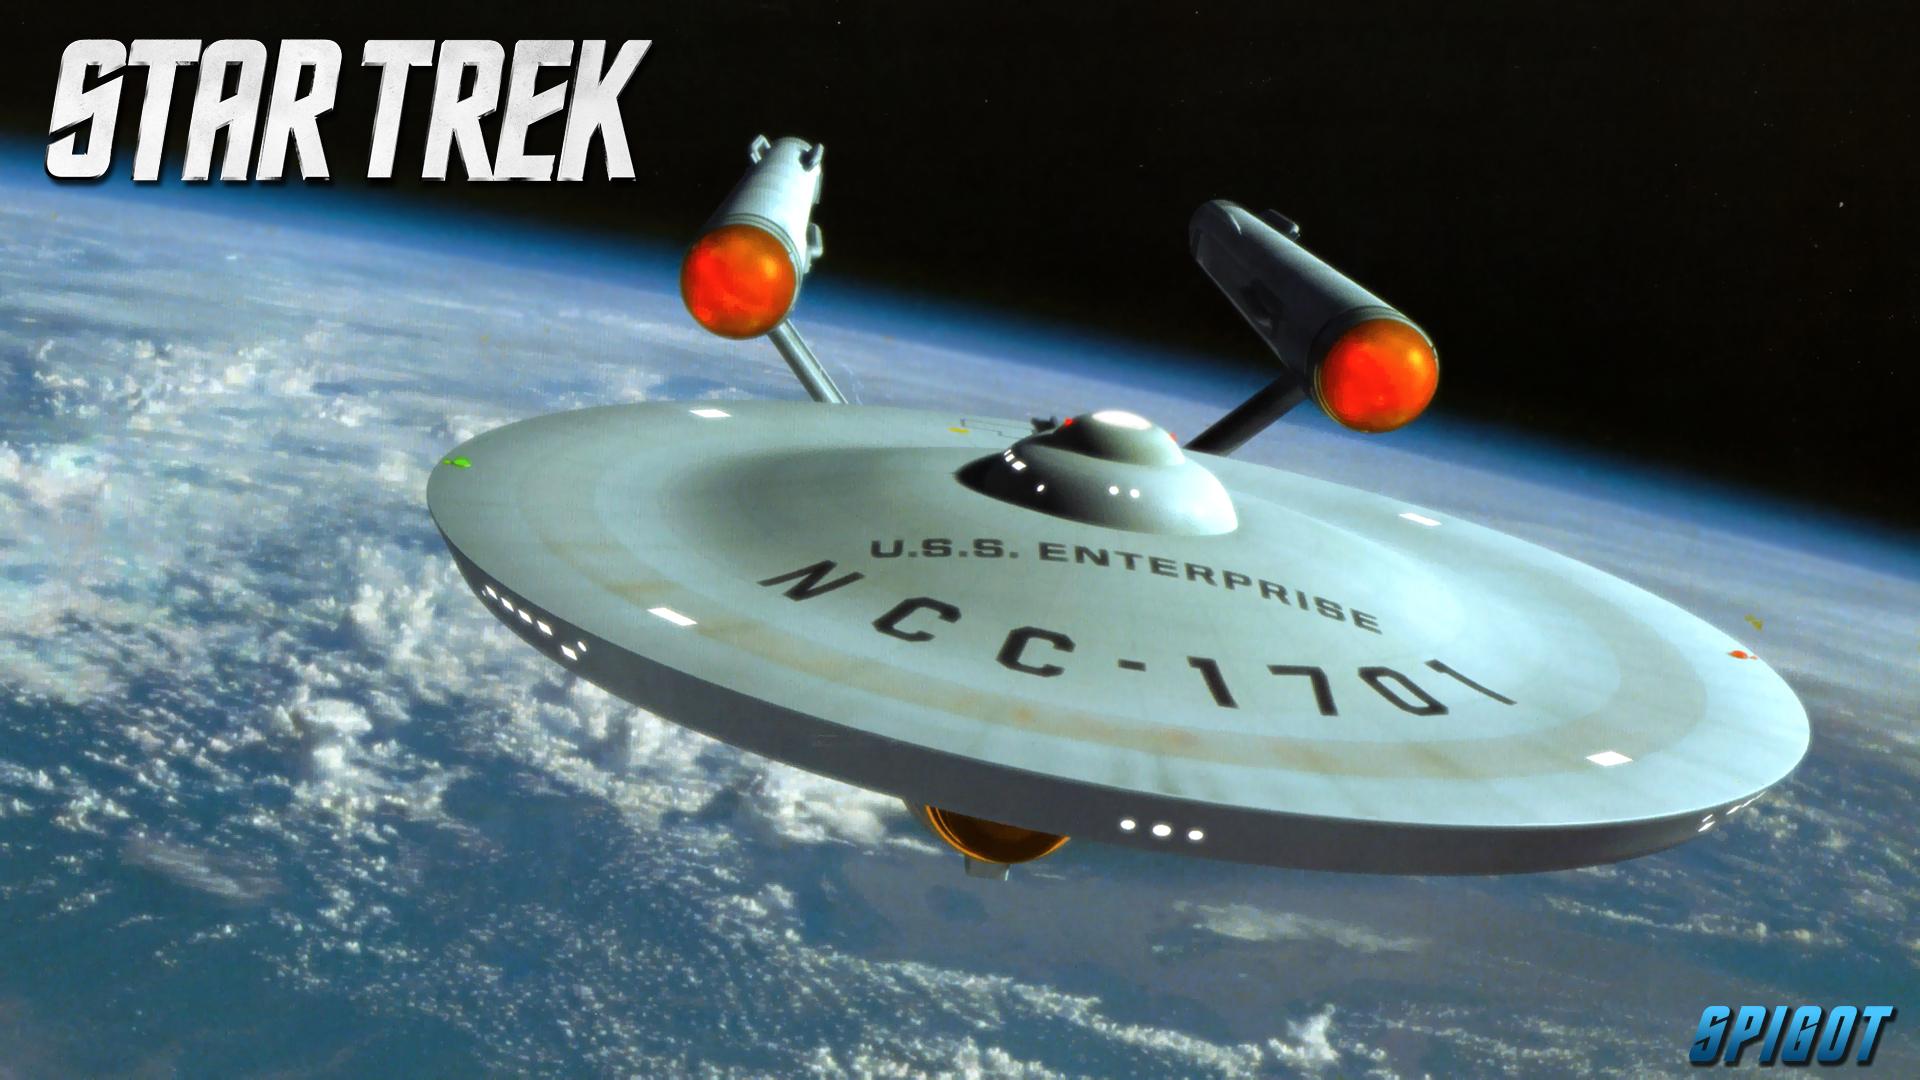 Star Trek Ship Wallpapers: George Spigot's Blog